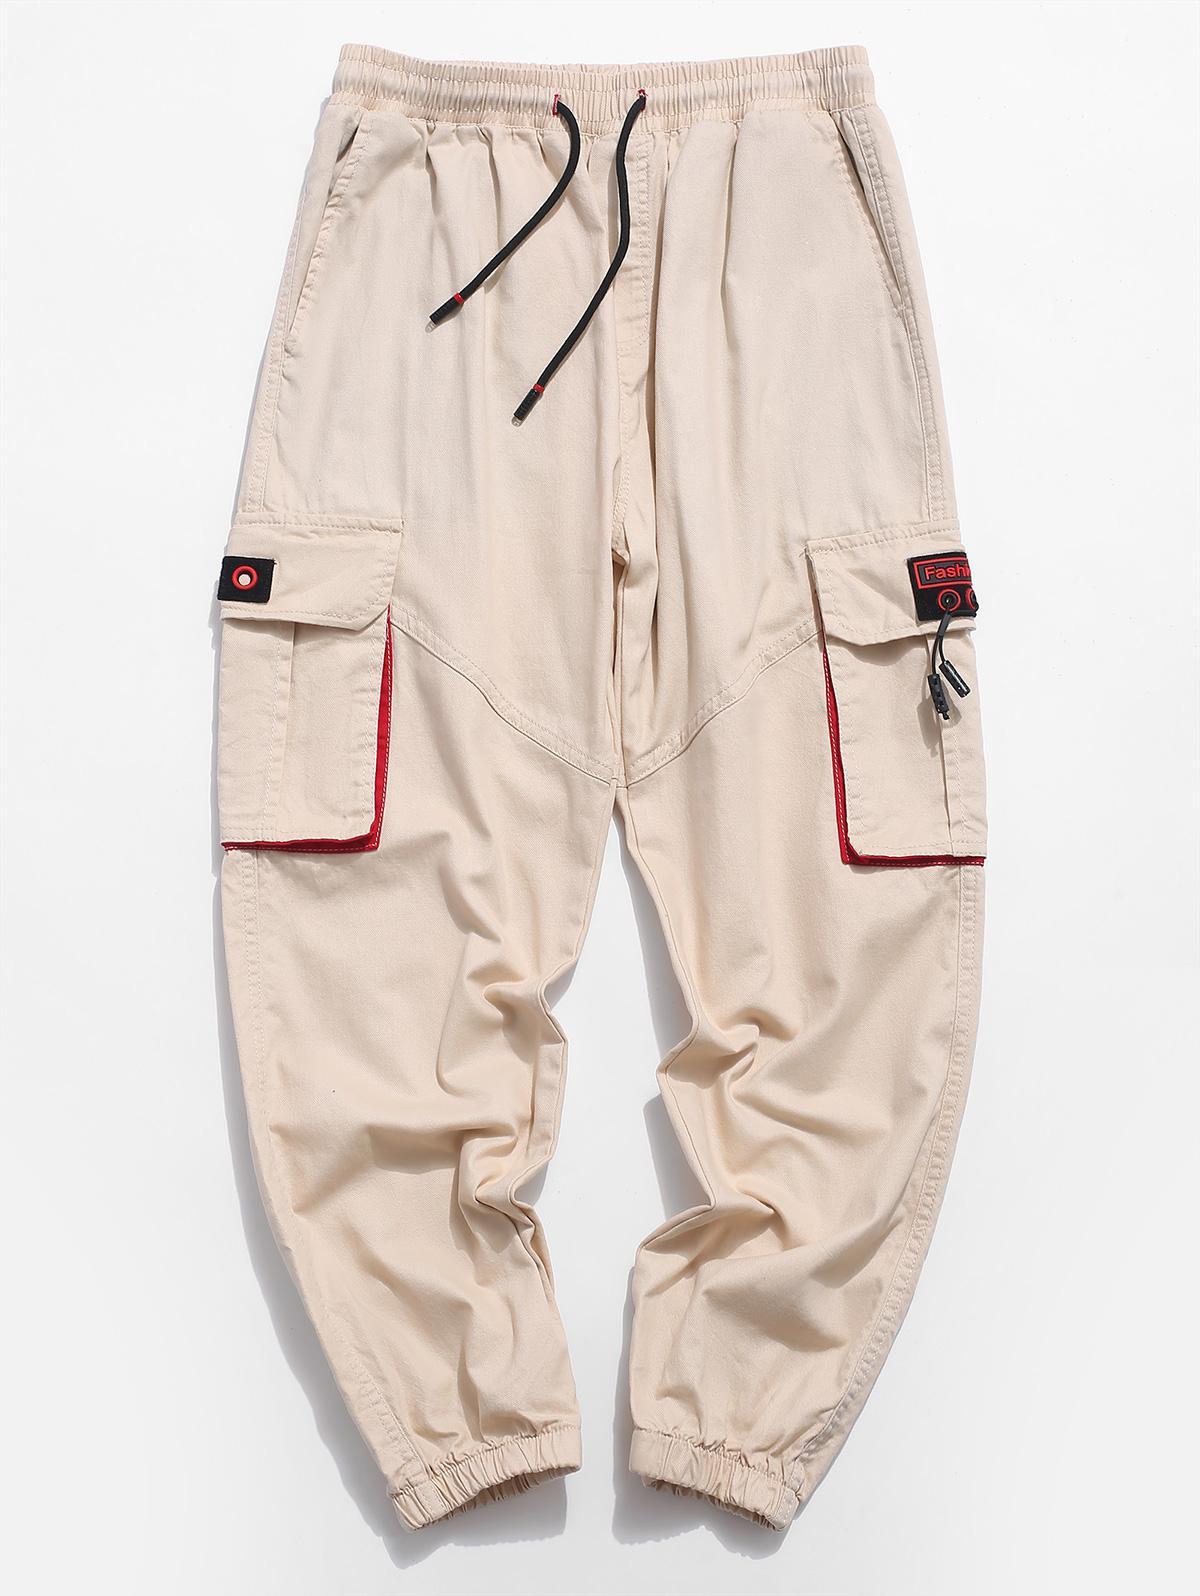 Multi-Pannello di tasca Coulisse Pantaloni Jogger